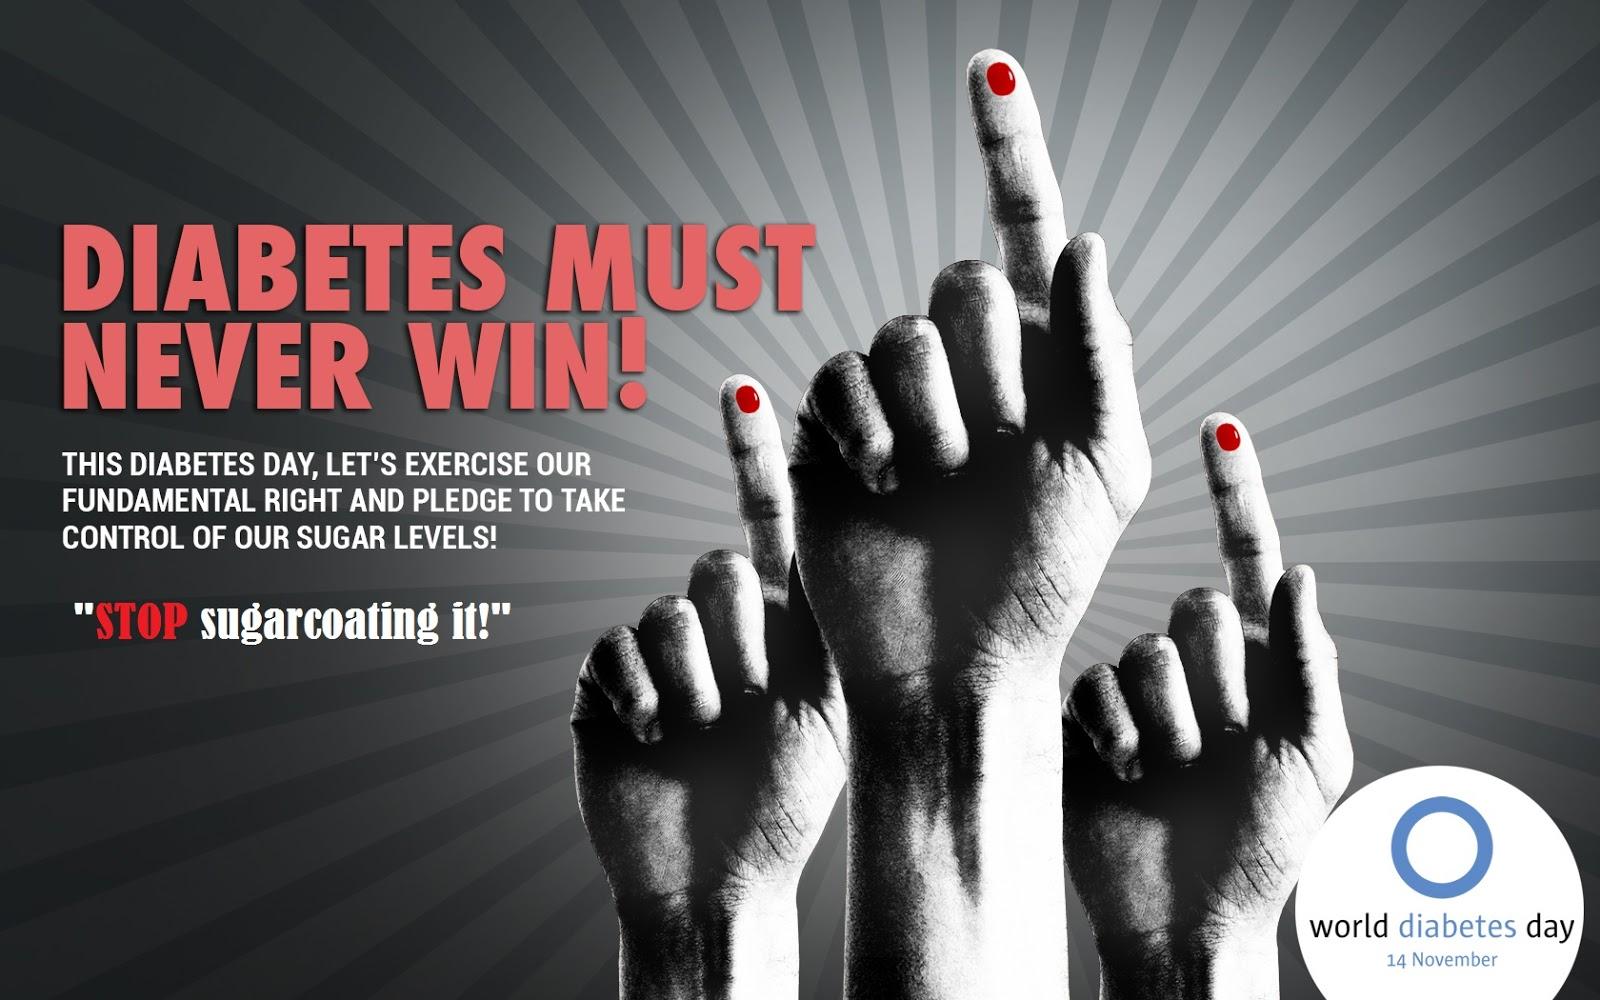 slogans on diabetes awareness